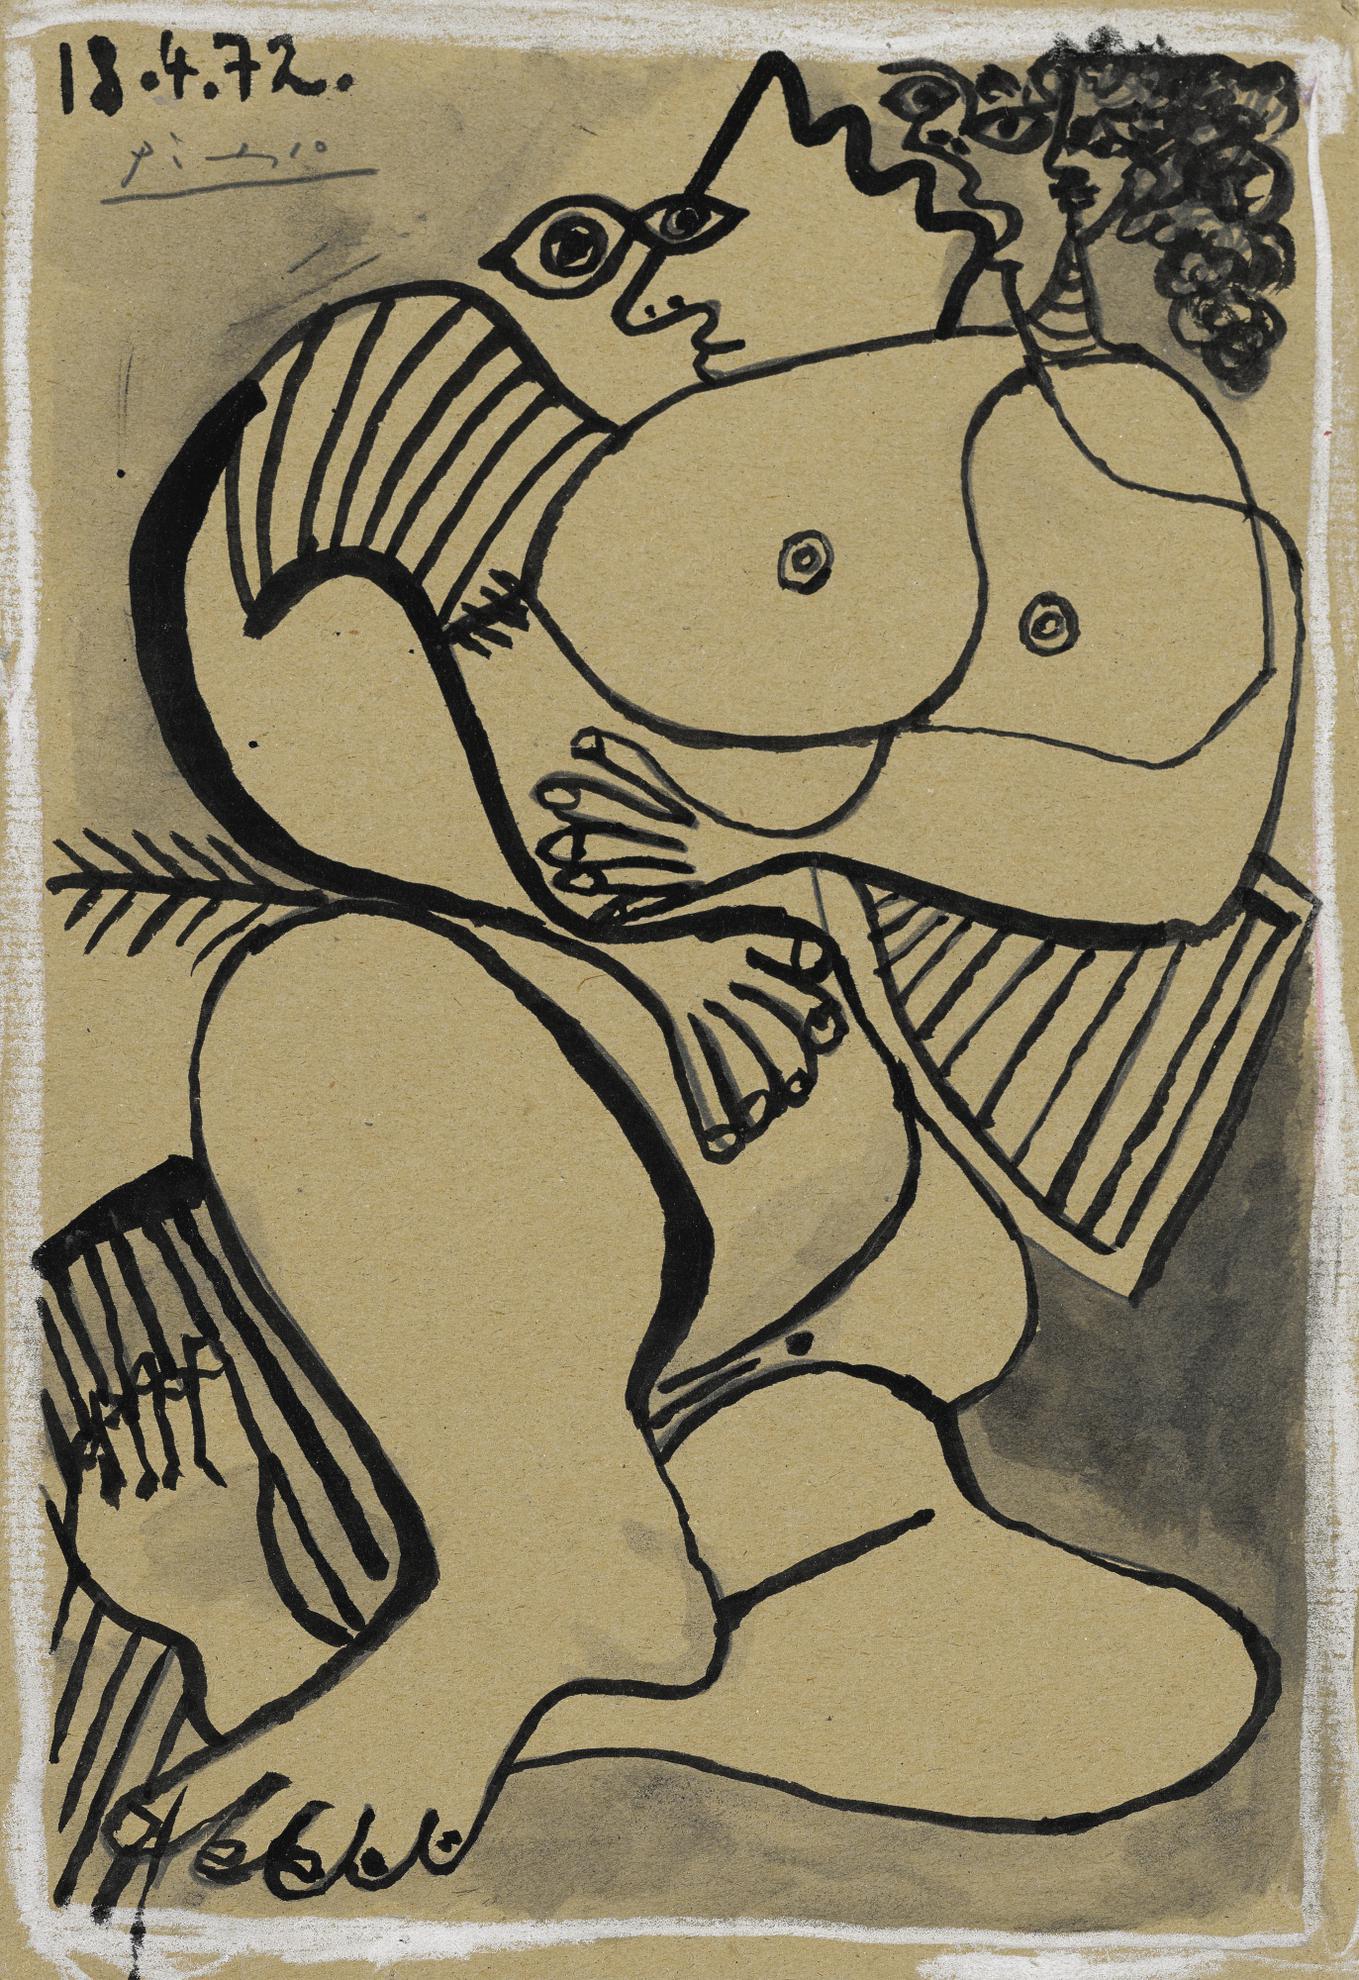 Pablo Picasso-Nu-1972